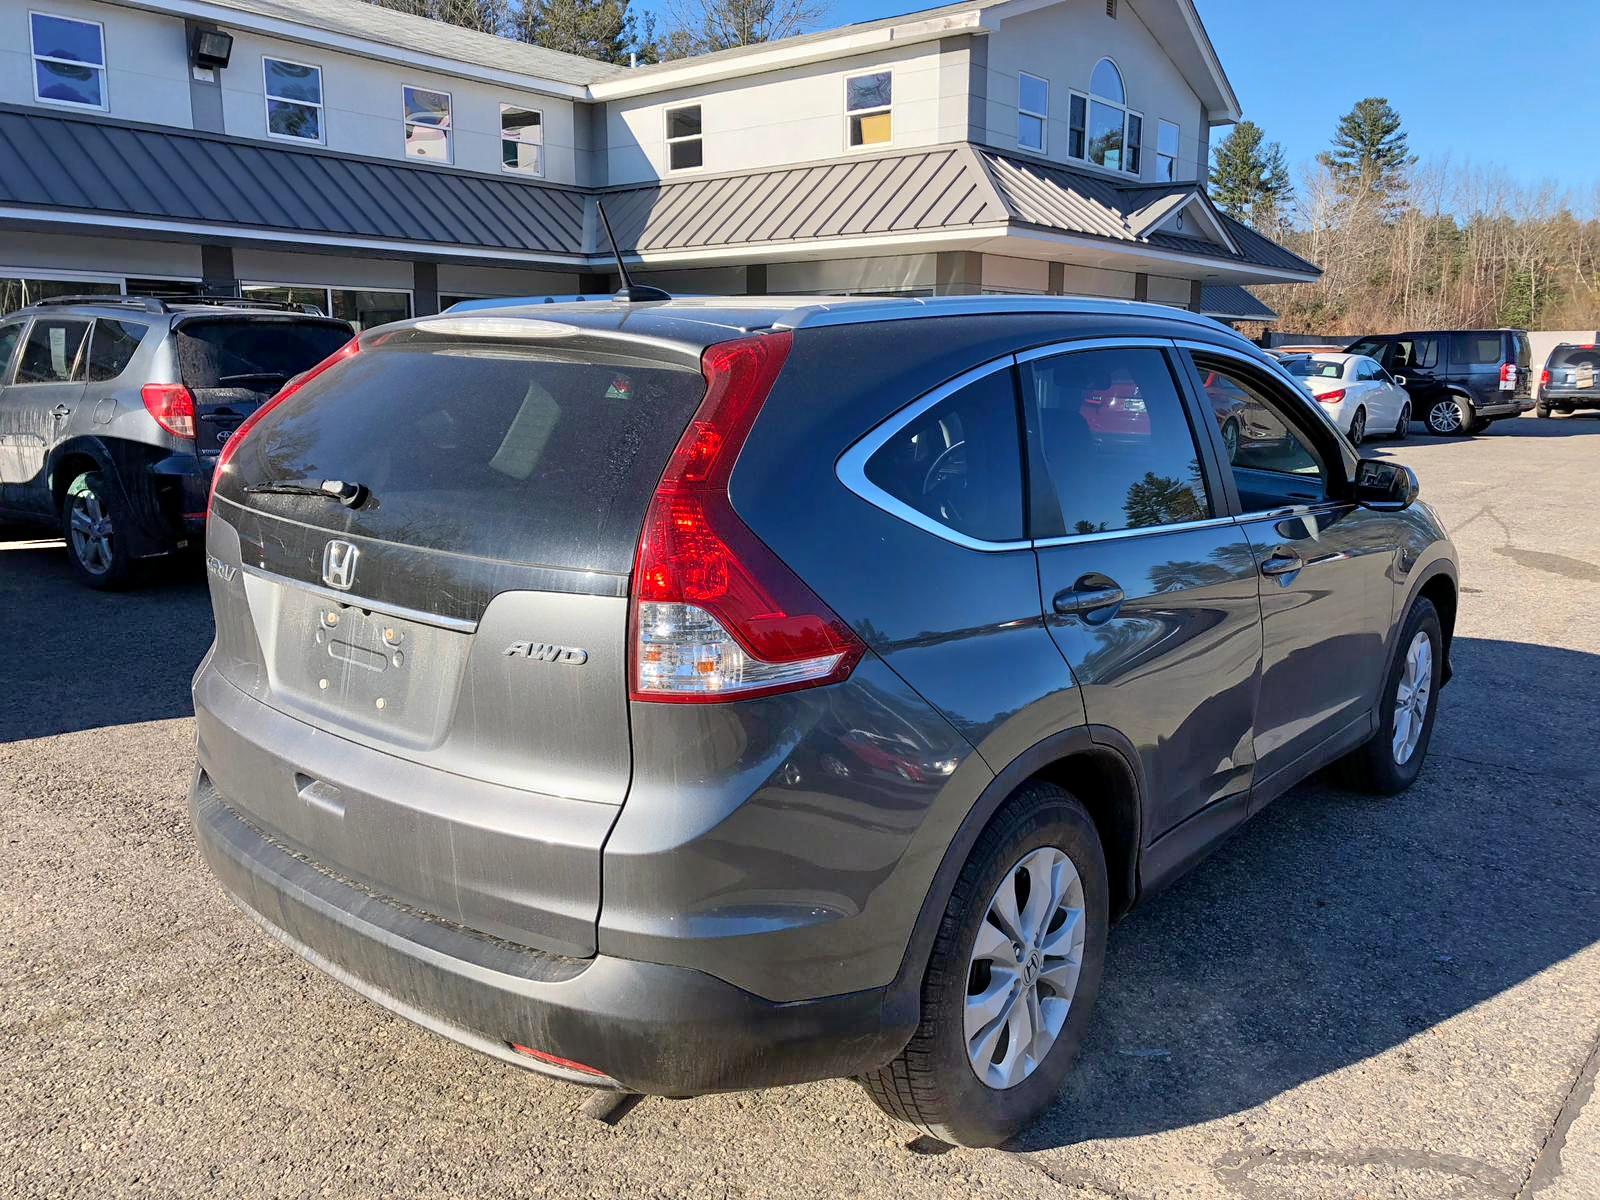 2HKRM4H73CH626699 - 2012 Honda Cr-V Exl 2.4L rear view